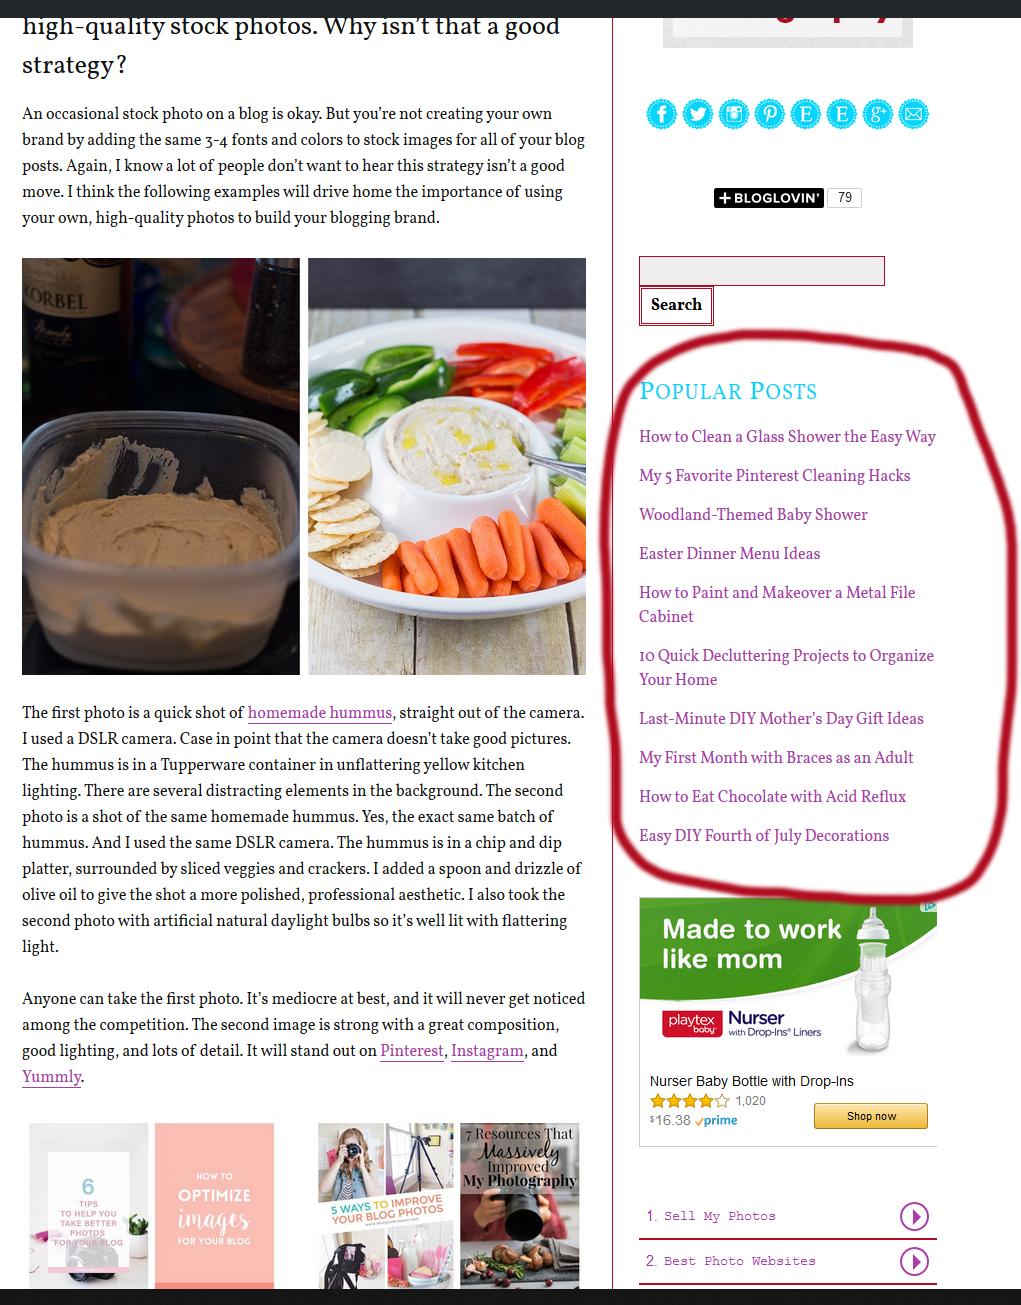 10 Ways to Improve an Old Blog Post - WordPress Popular Posts Plugin | https://www.roseclearfield.com